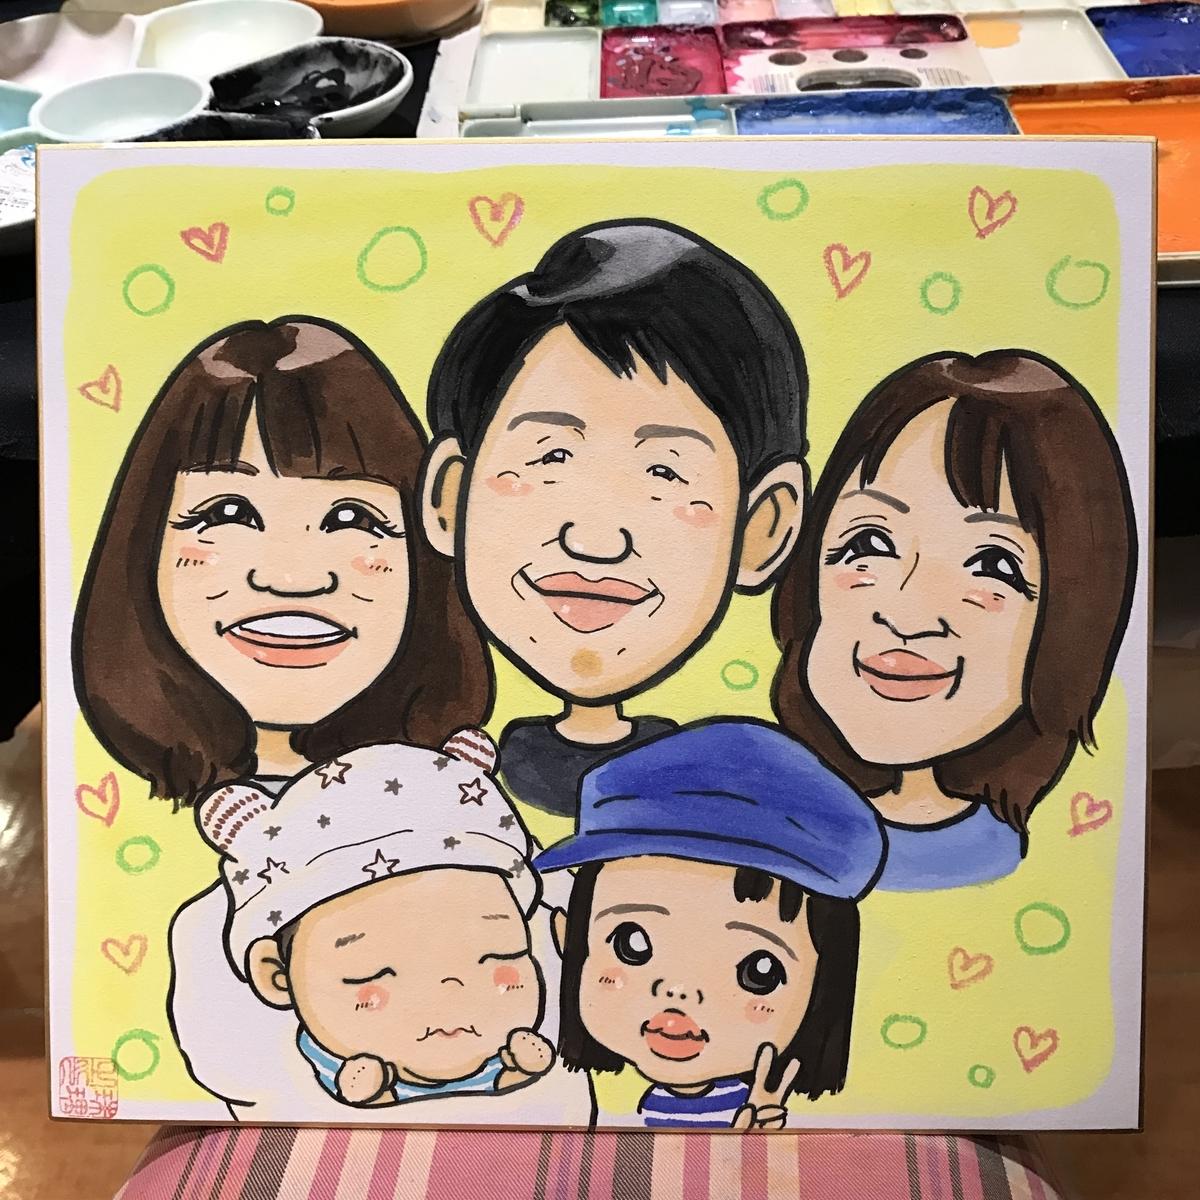 家族5人の似顔絵